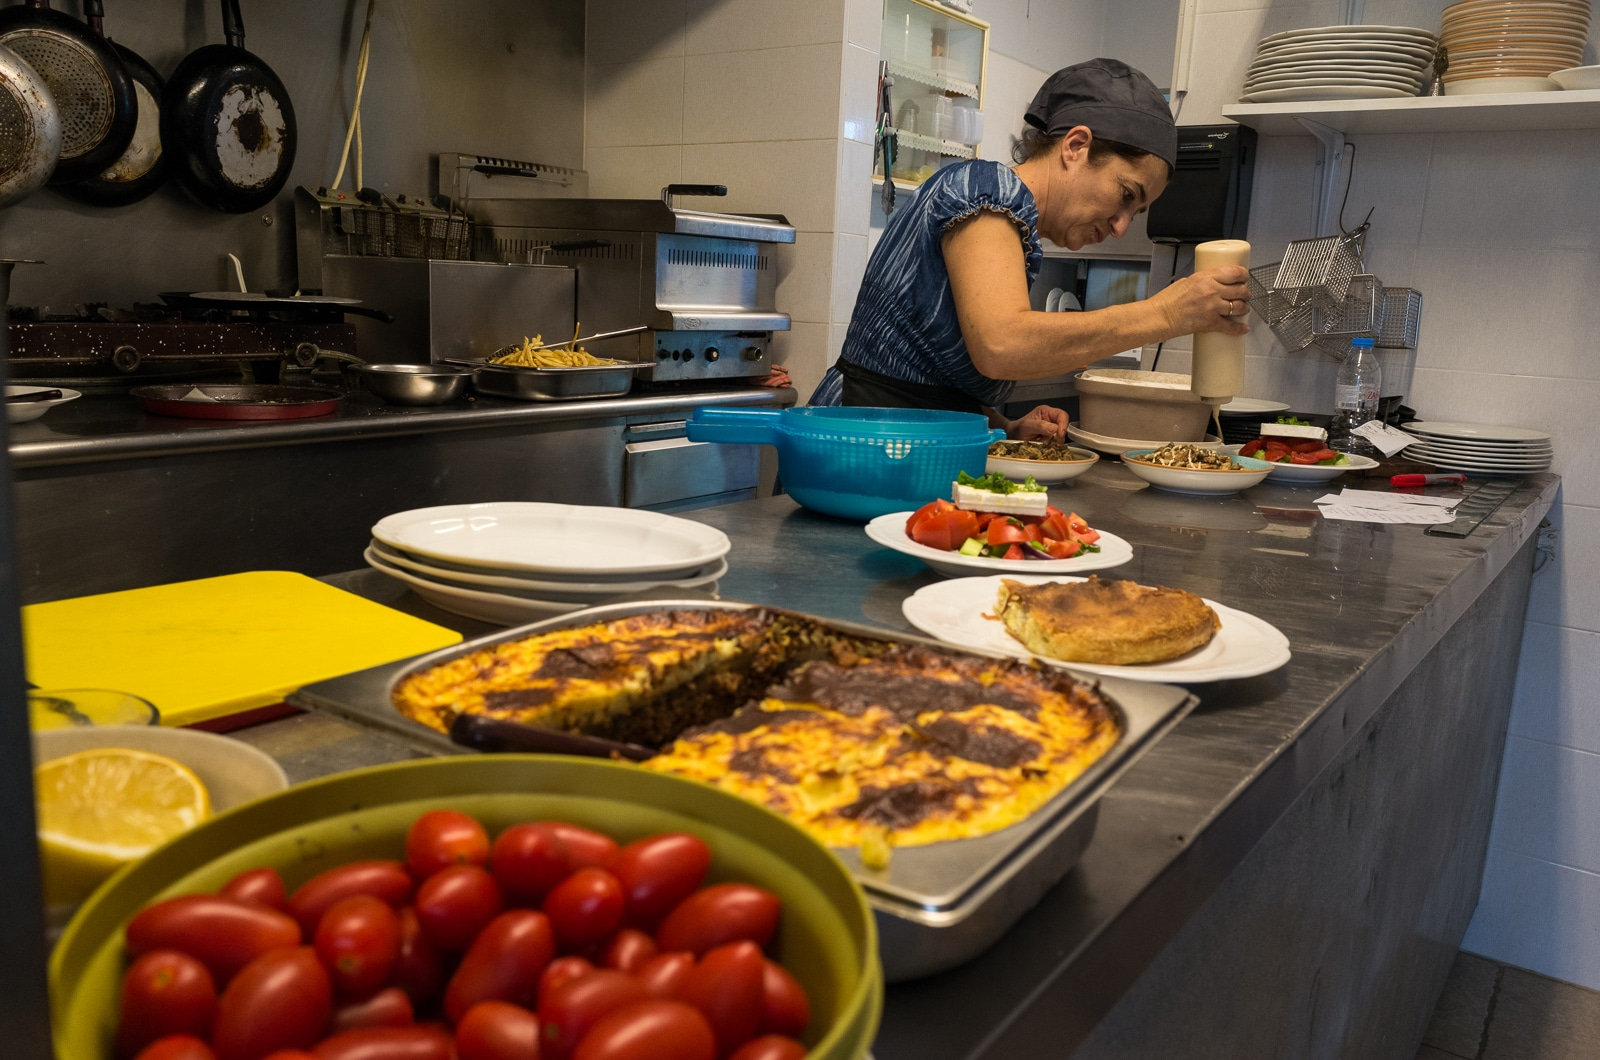 Syros : A Greek Island with Roman Influence aVentura restaurant